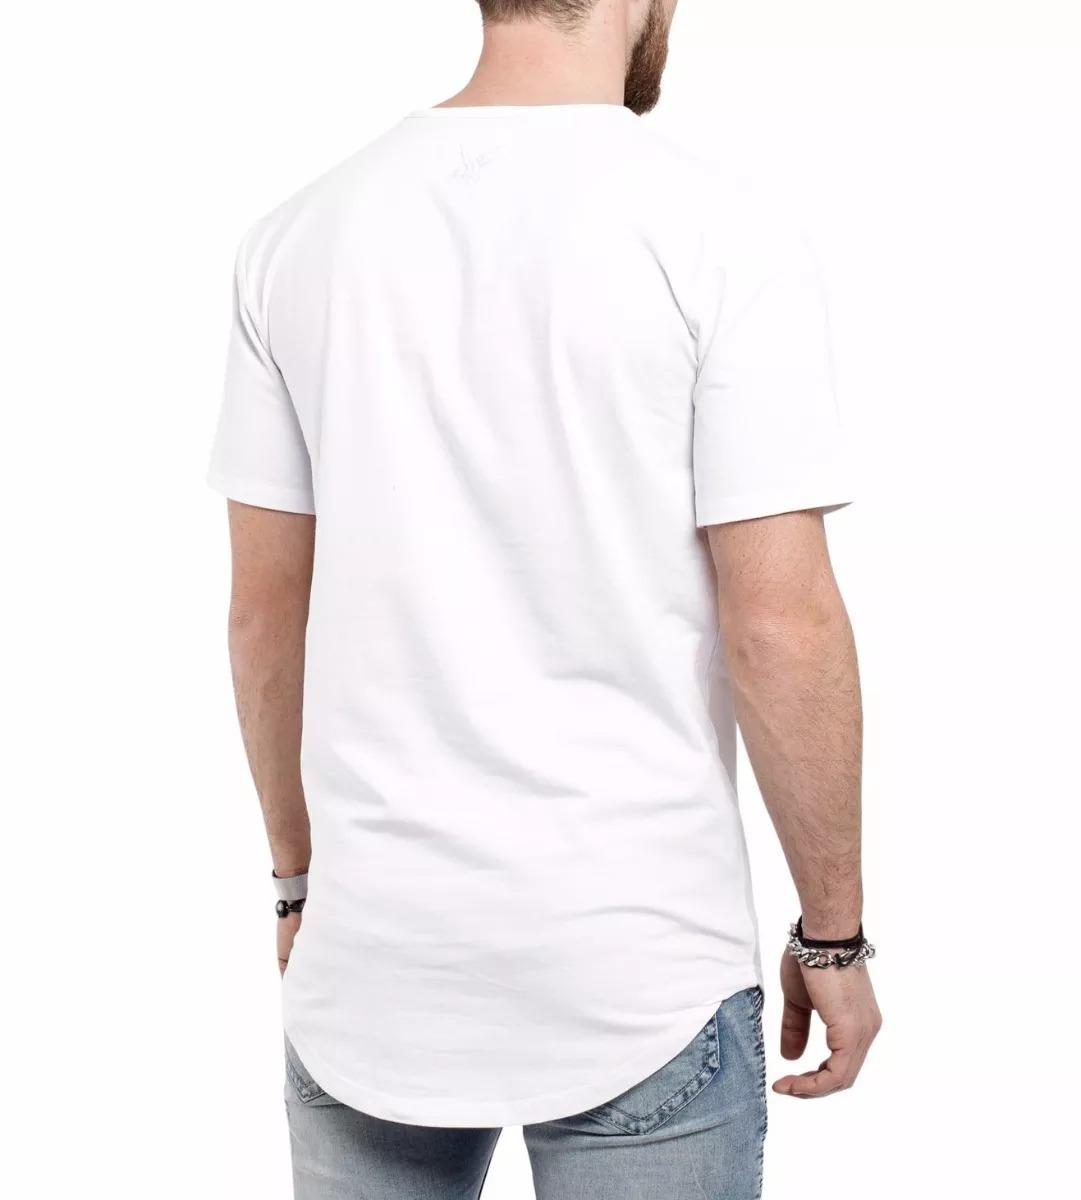 dac30d685 camiseta oversized masculina long line branca raiders. Carregando zoom.